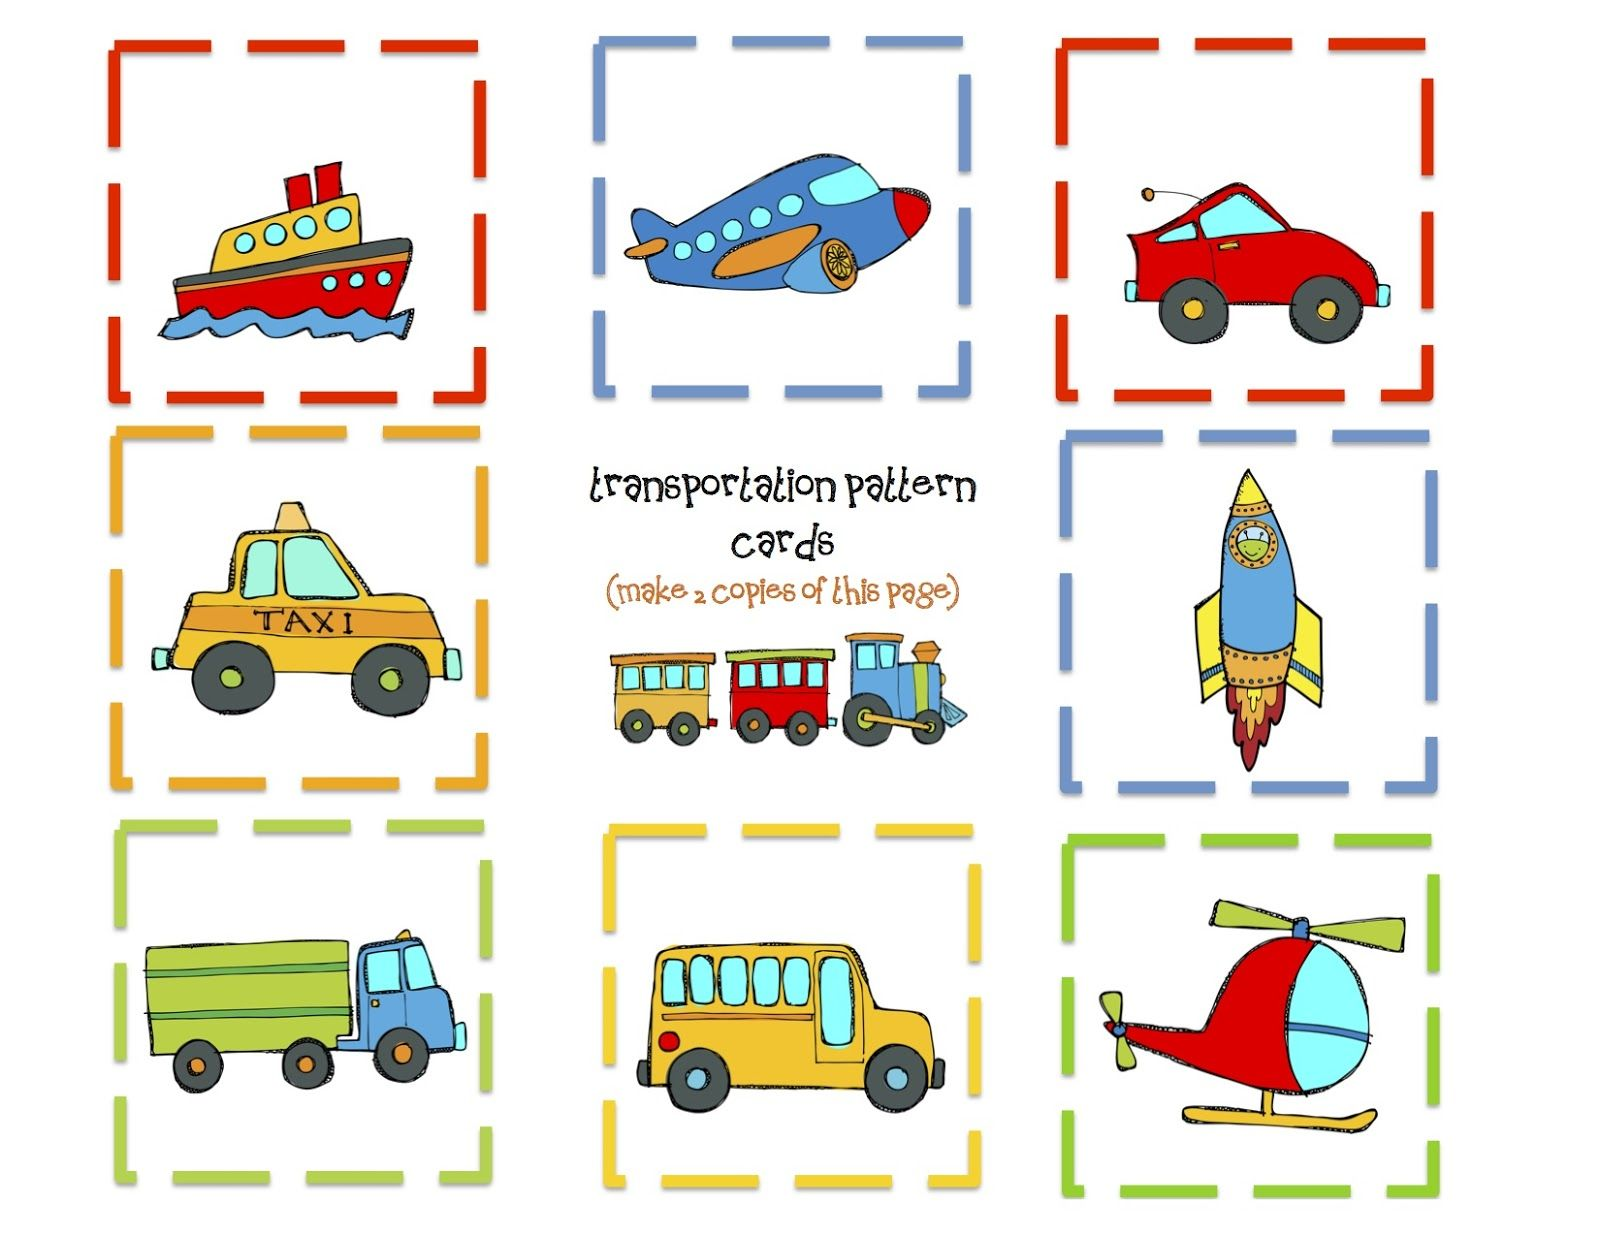 Transportation 9 Pattern Cards 1 600 1 236 Pixels